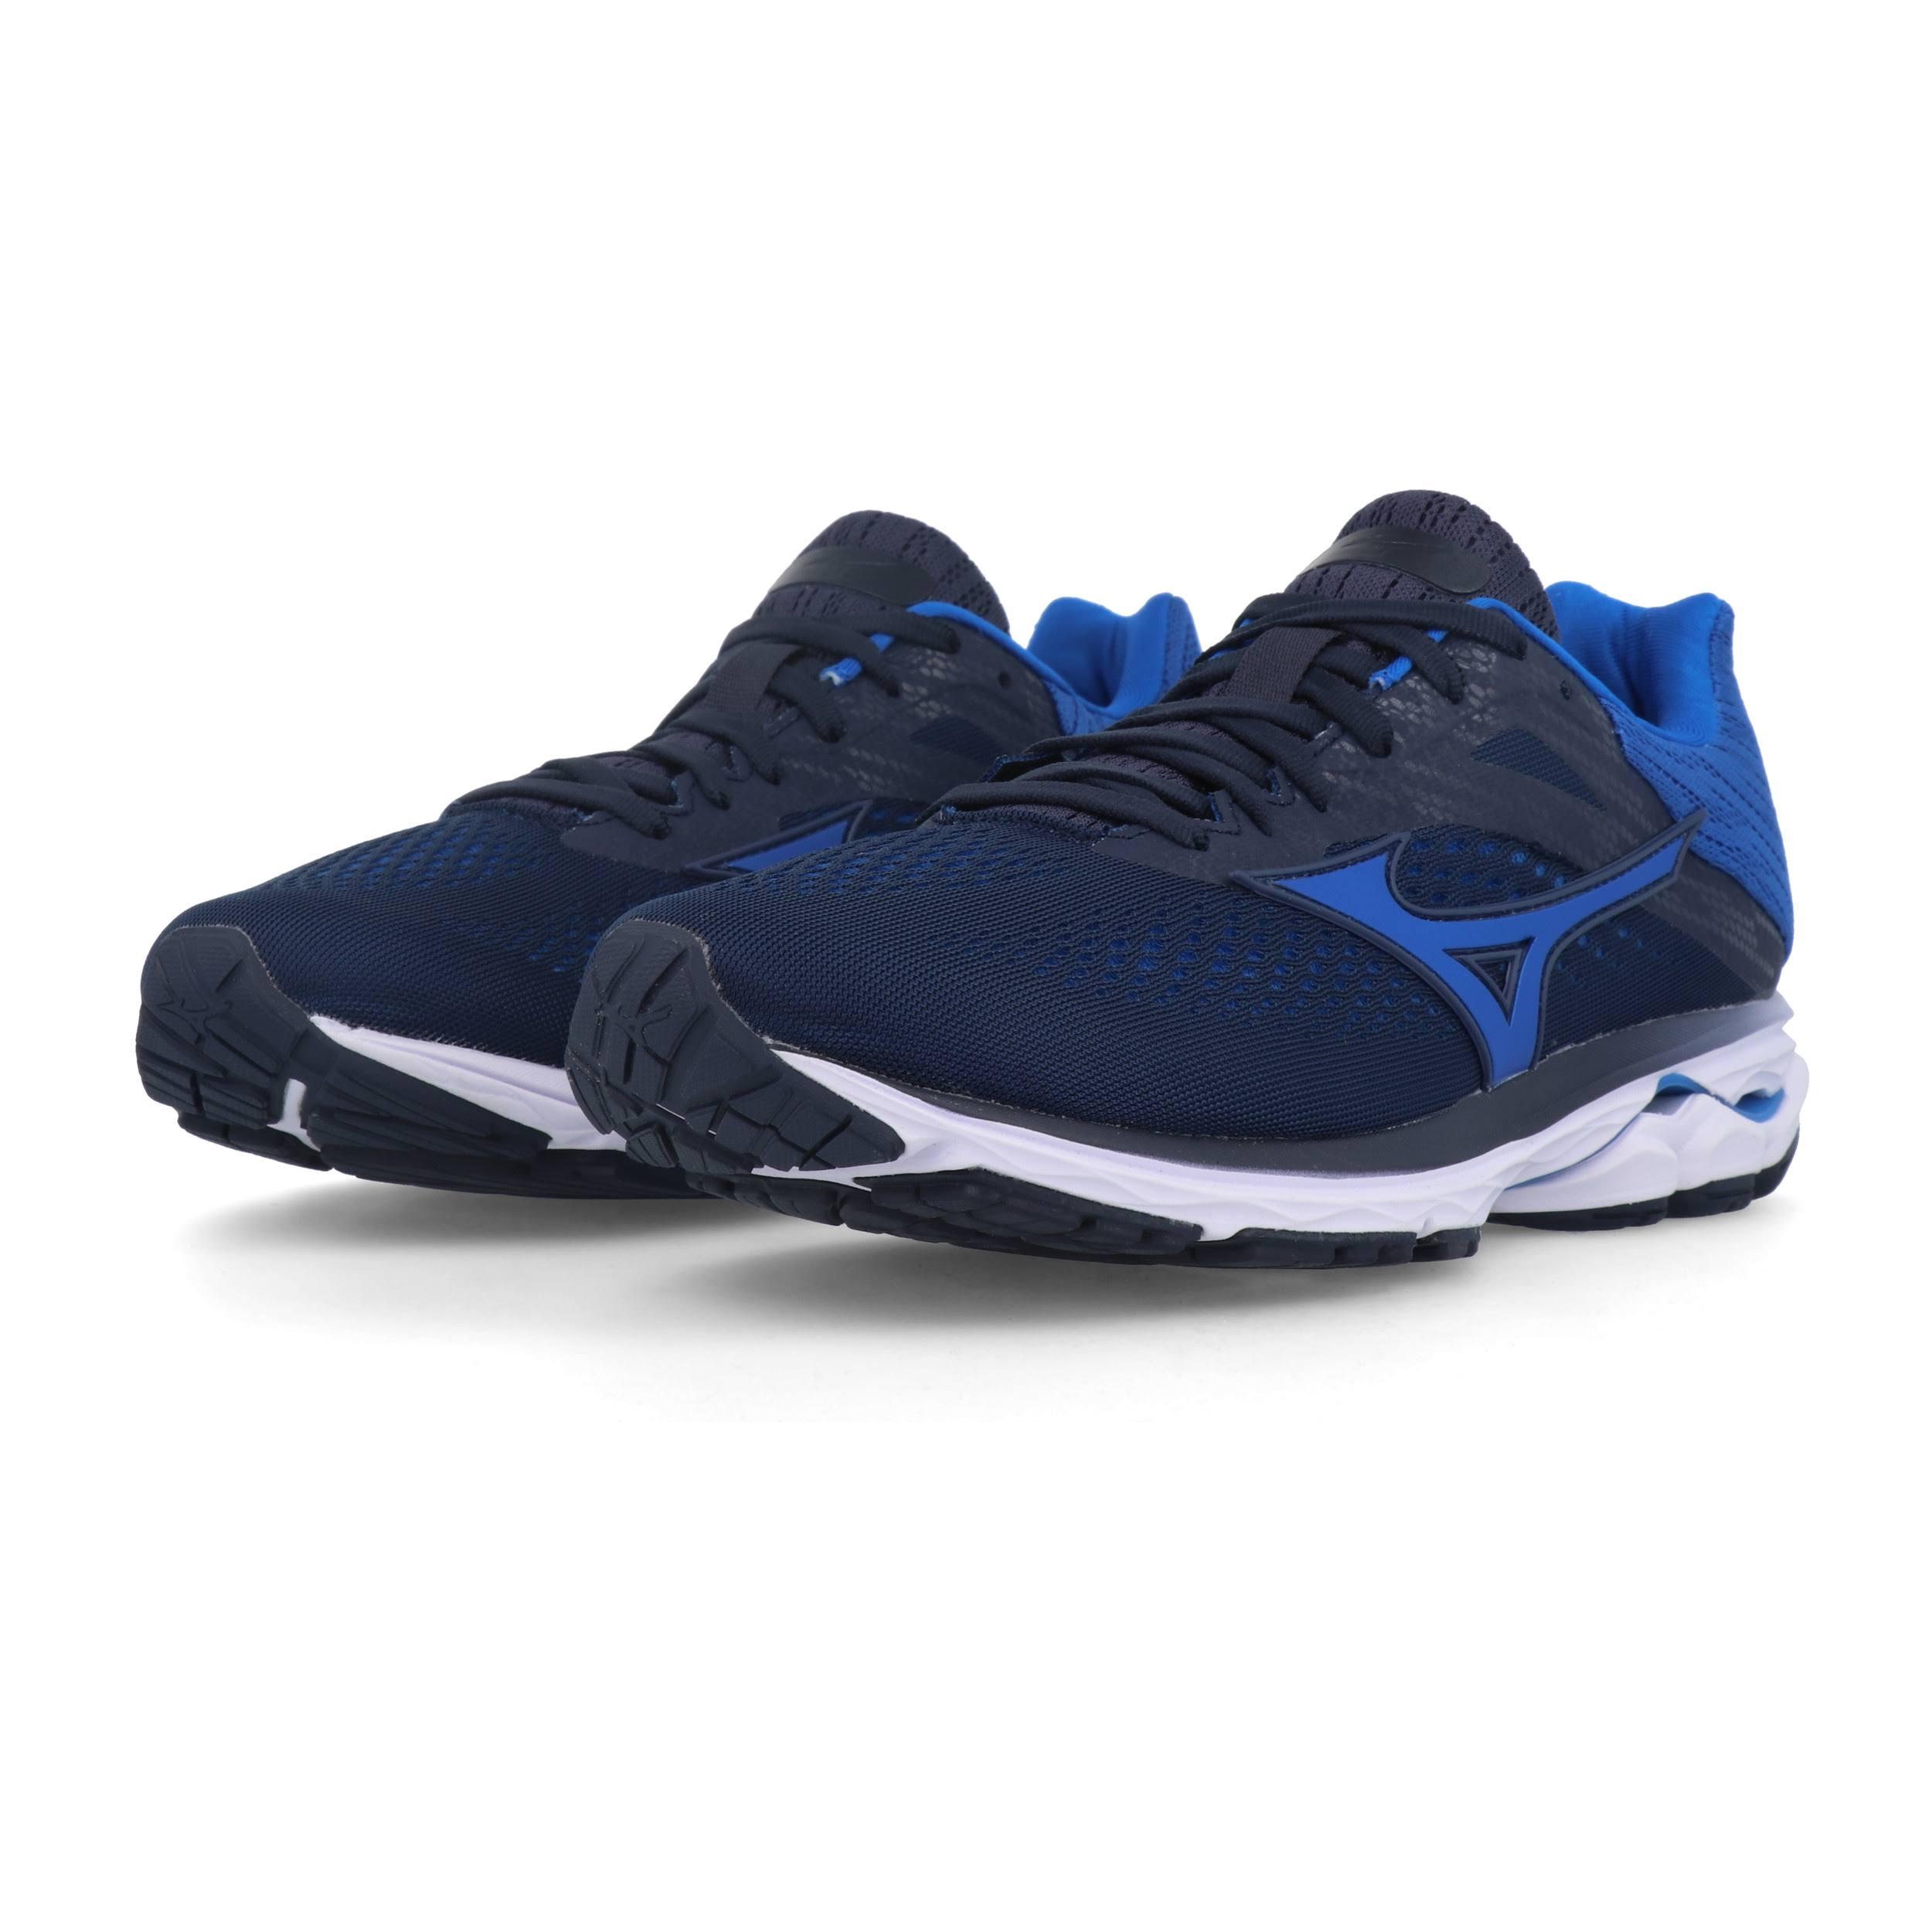 Mizuno Men's Wave Rider 23 Running Shoes